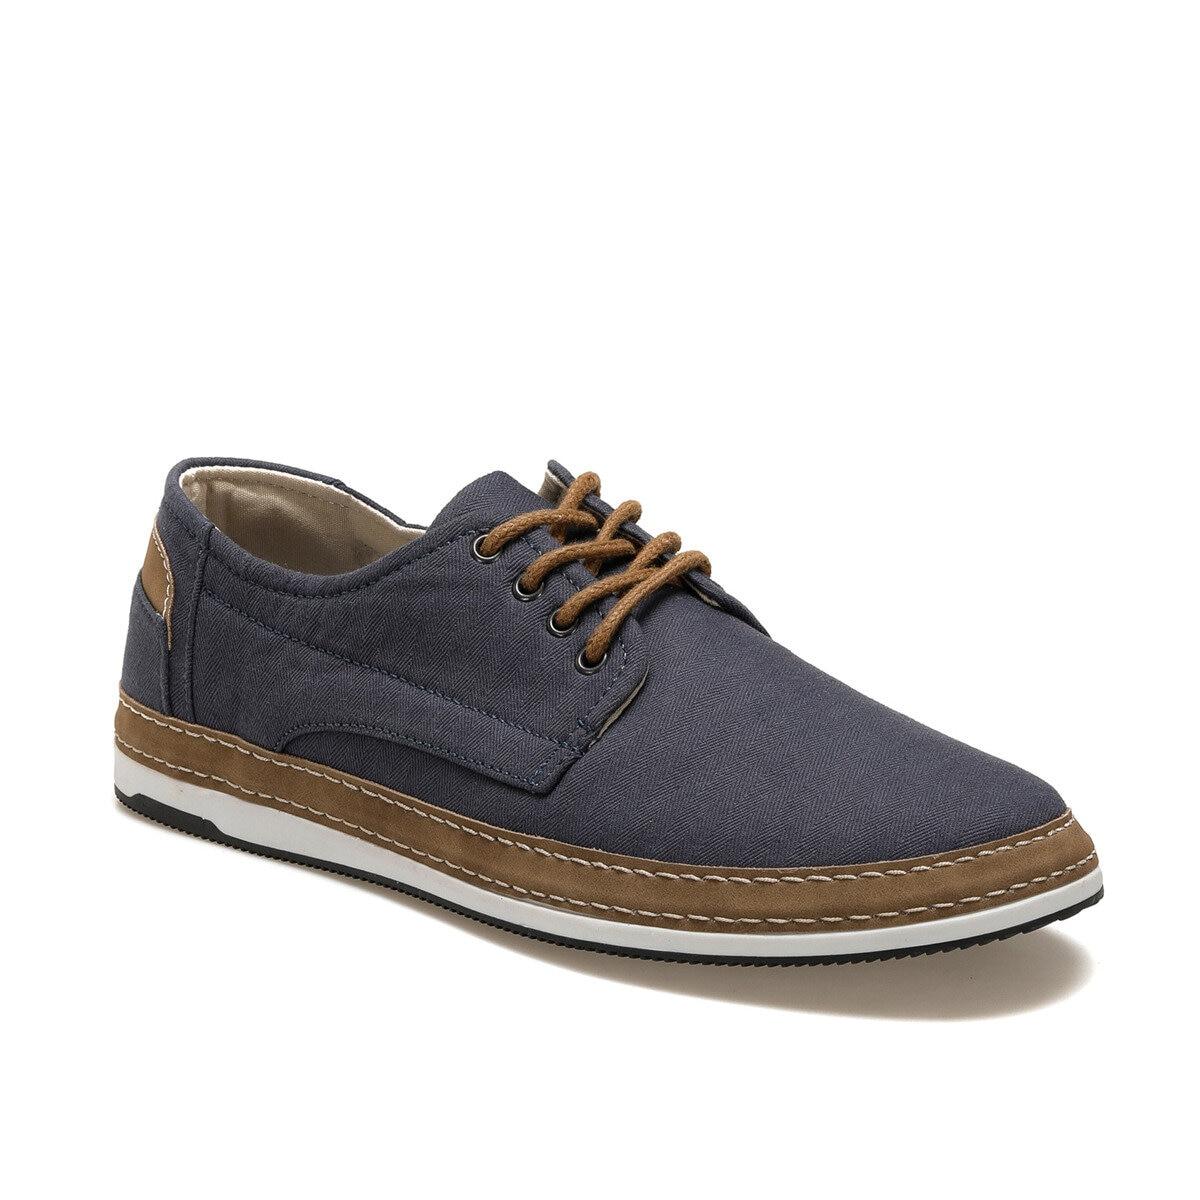 FLO G-120-1 Blue Men 'S Dress Shoes JJ-Stiller